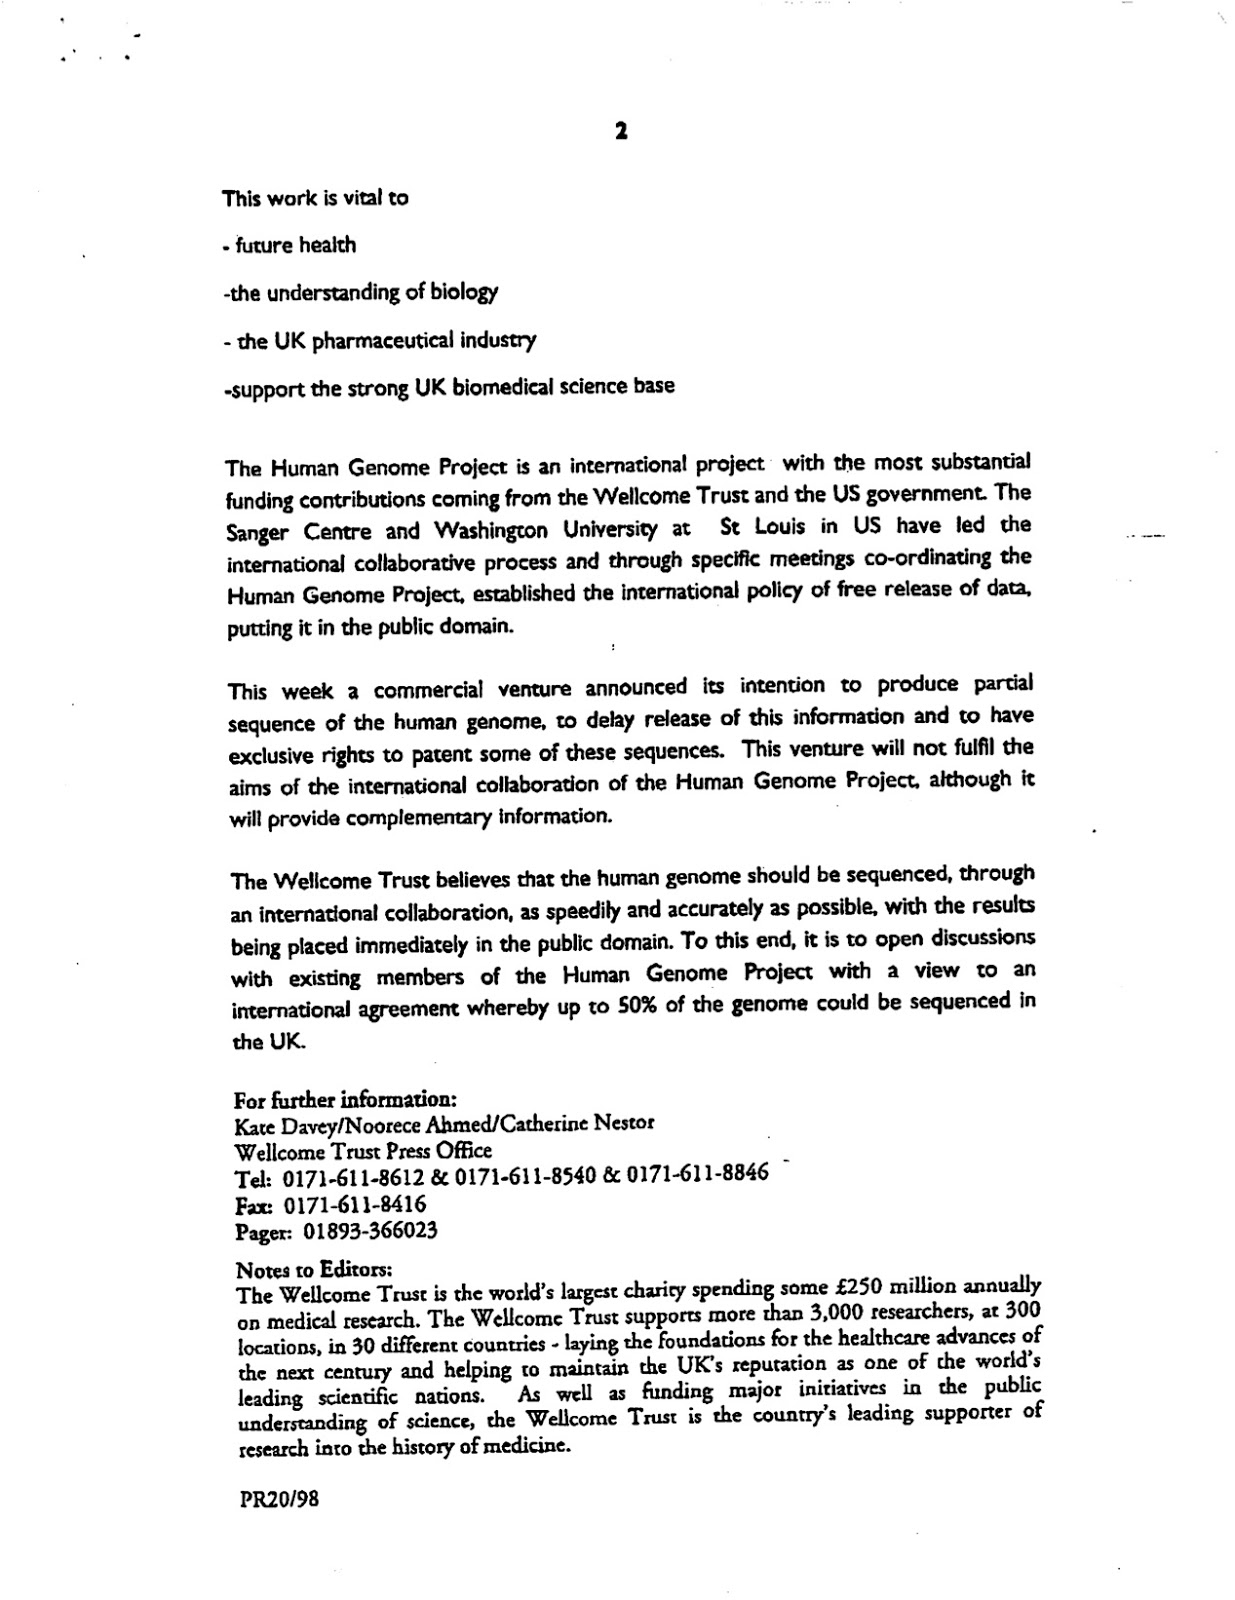 press release cover letter